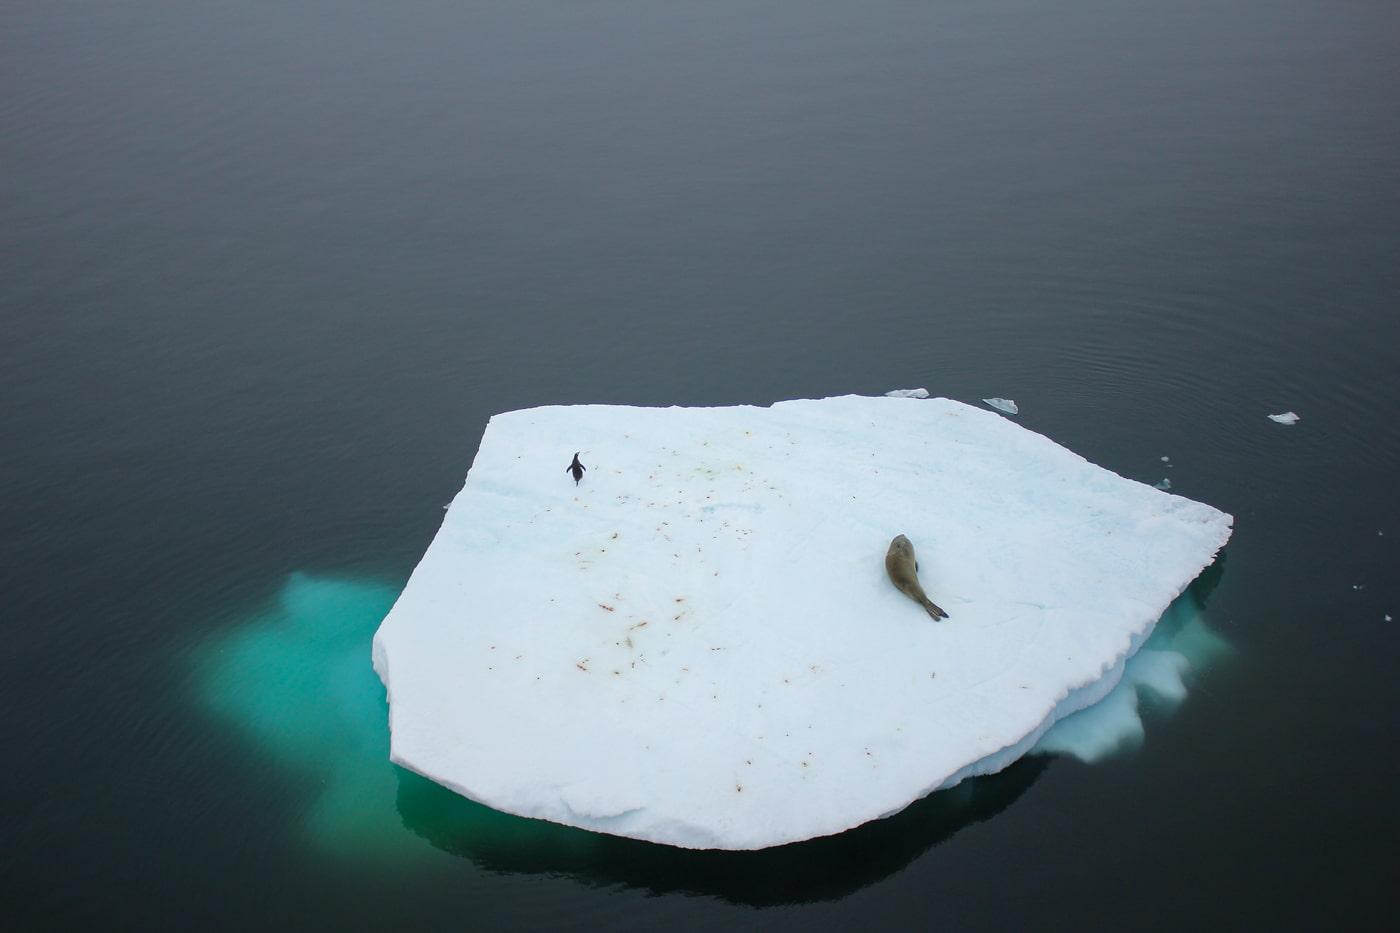 Global warming in Antartica